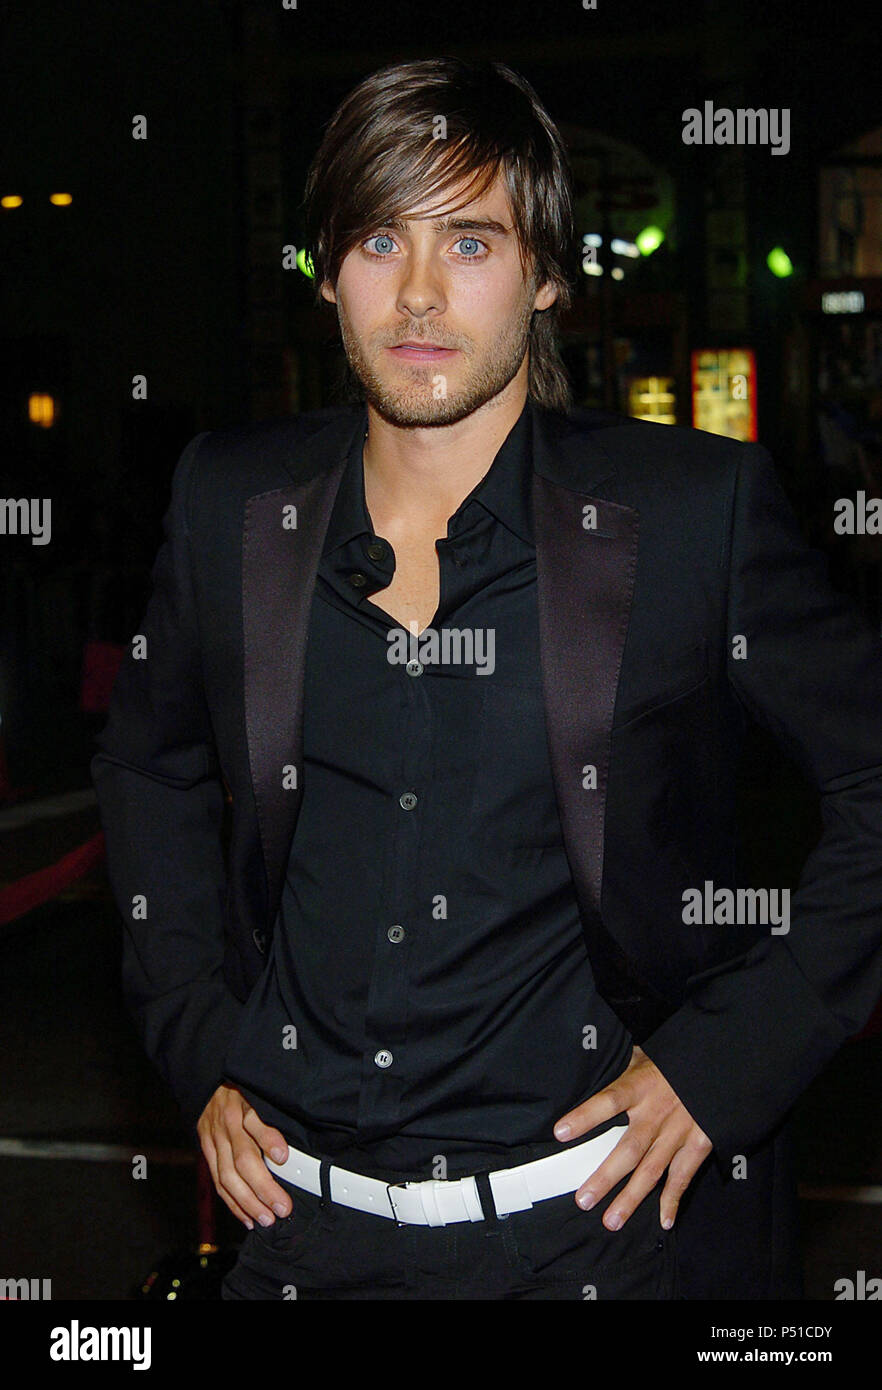 Men in Style: актер-хамелеон и икона стиля rock chic Джаред Лето ... | 1390x882